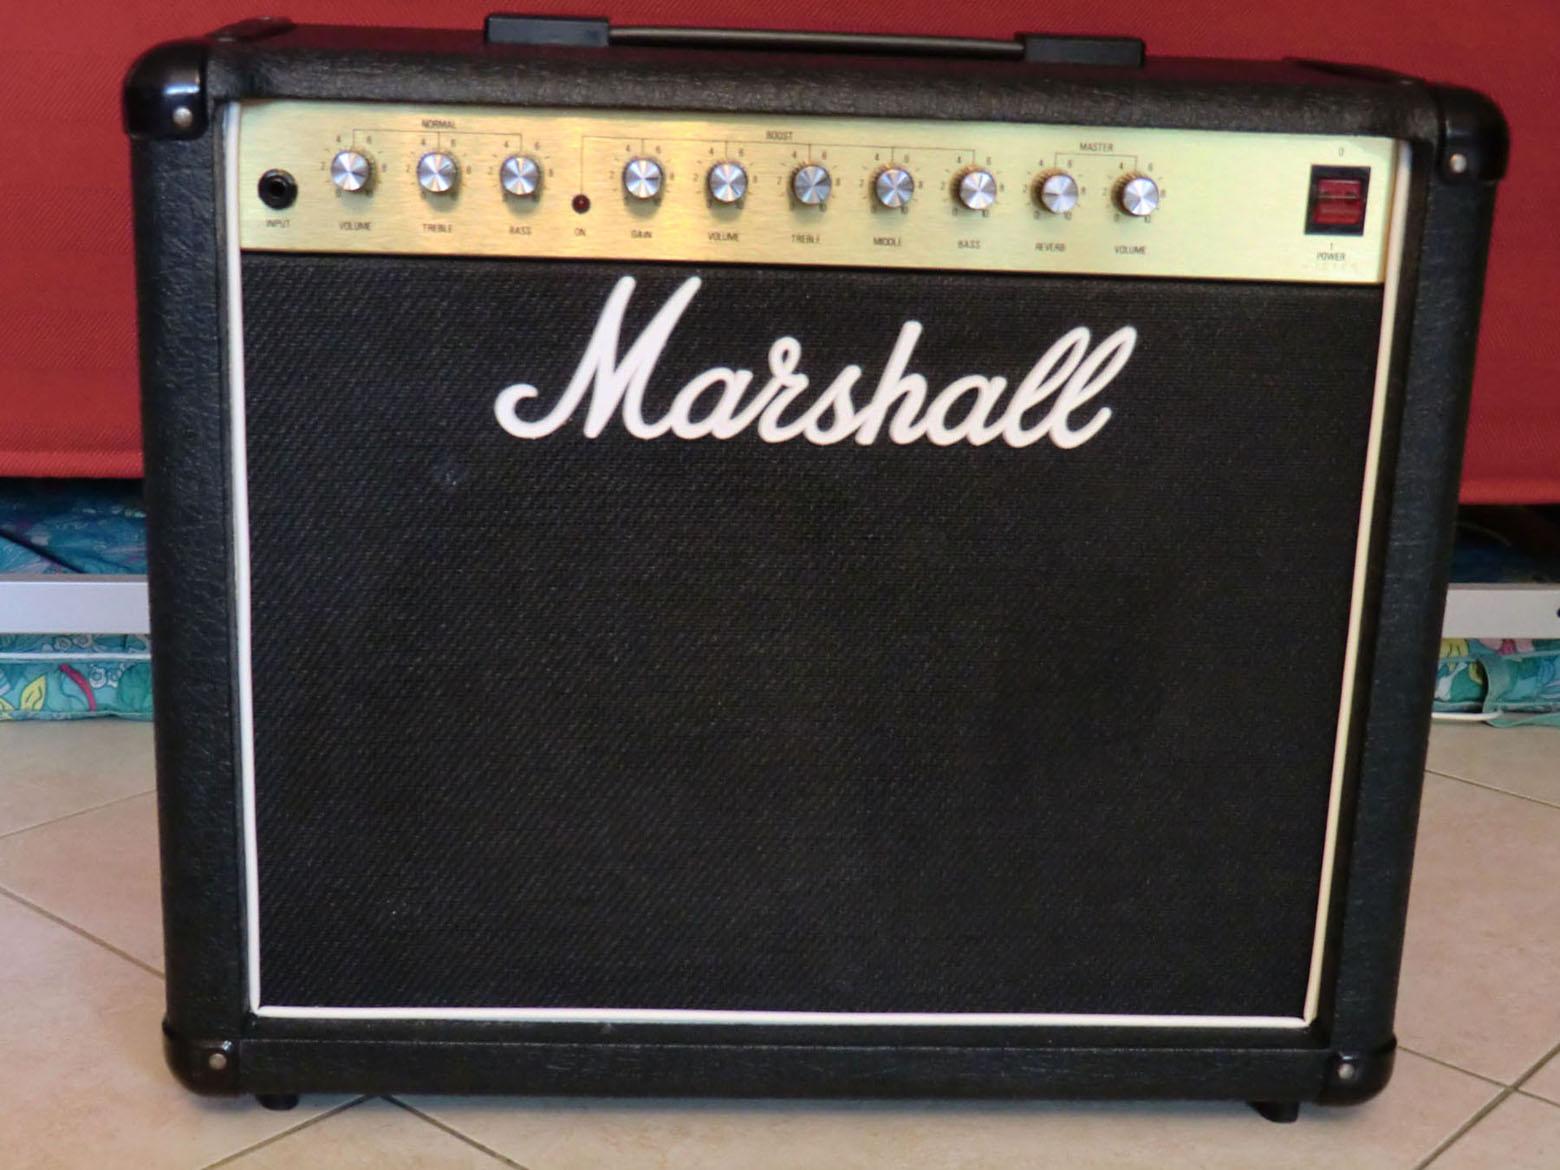 marshall 5210 1x12 combo amp vinyl amplifier cover mars018 ebay. Black Bedroom Furniture Sets. Home Design Ideas